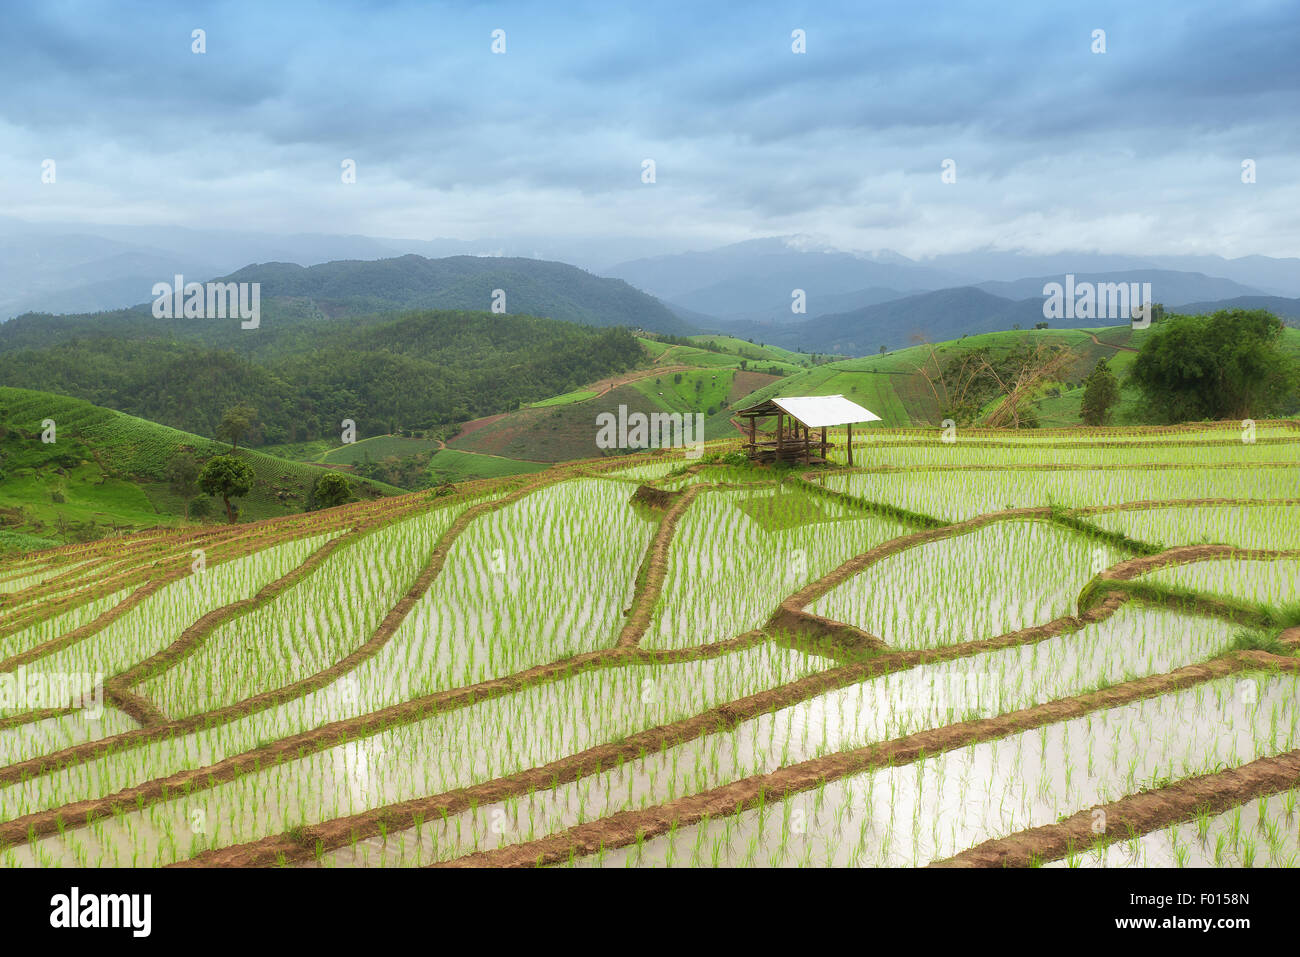 Champ de riz en terrasses vert dans Pa Pong Pieng, Chiang Mai, Thaïlande Photo Stock